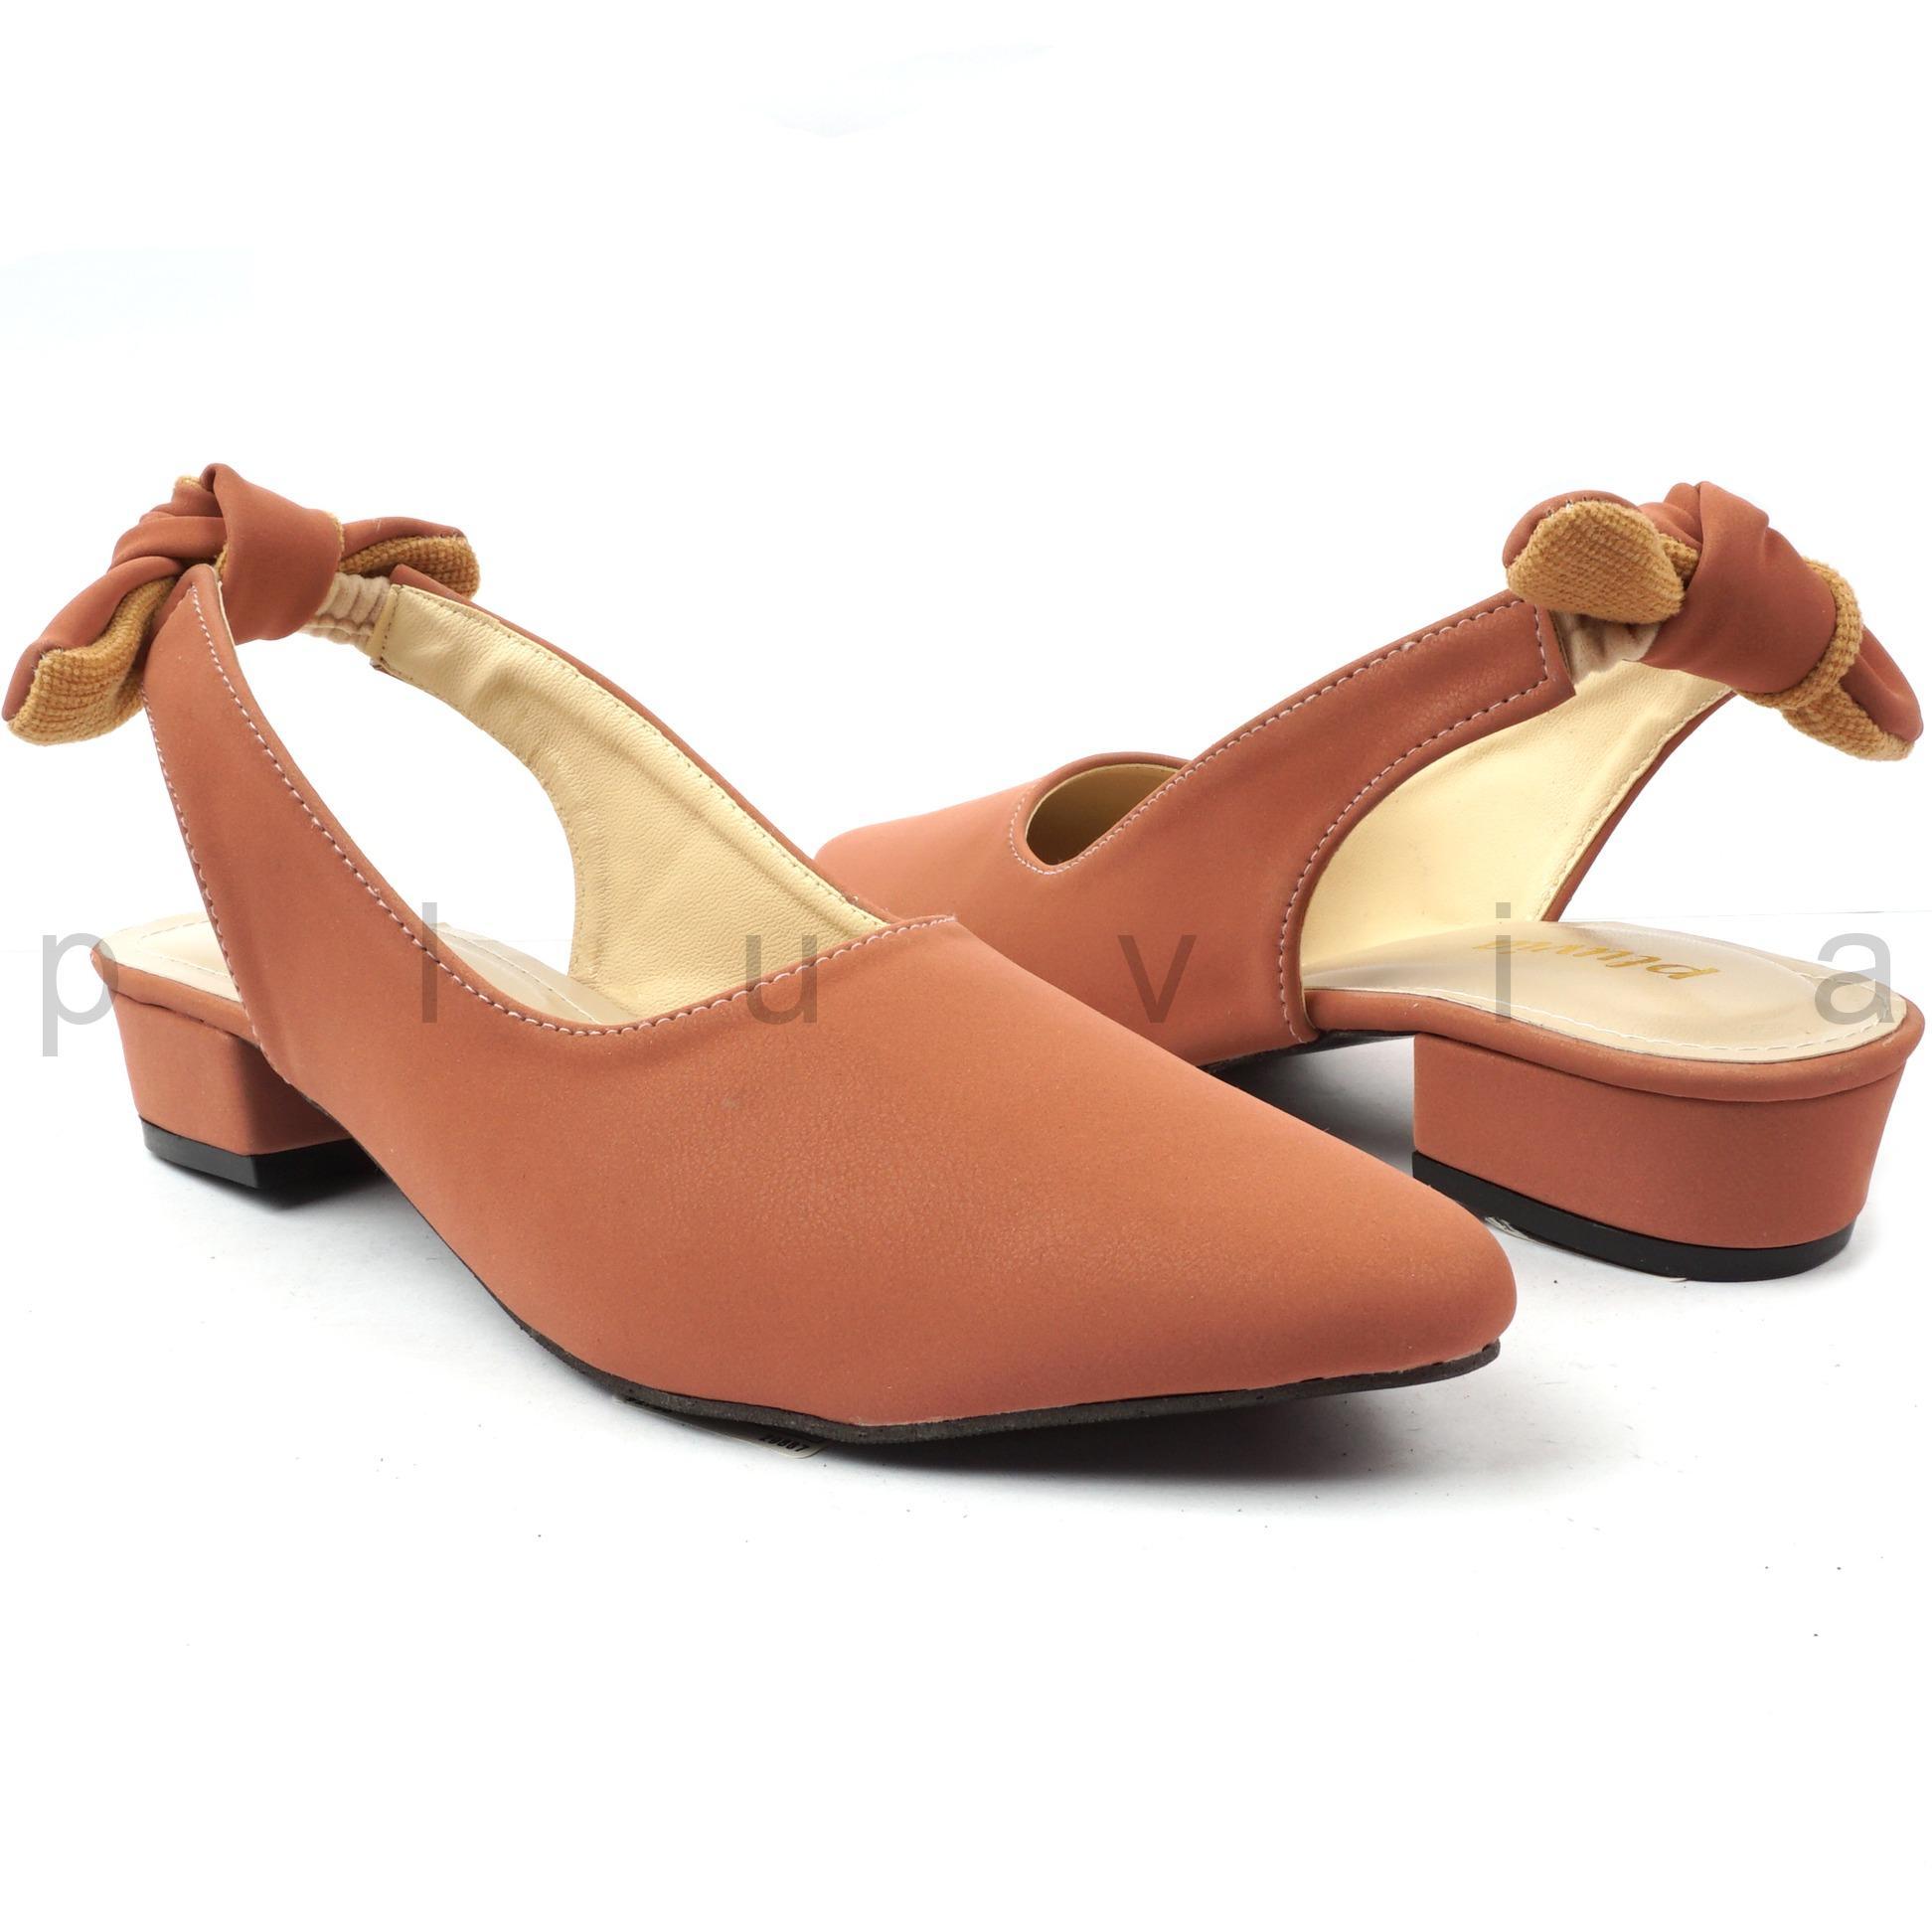 Review Pada Pluvia Harriet Sepatu Midi High Heels Wanita Ht05